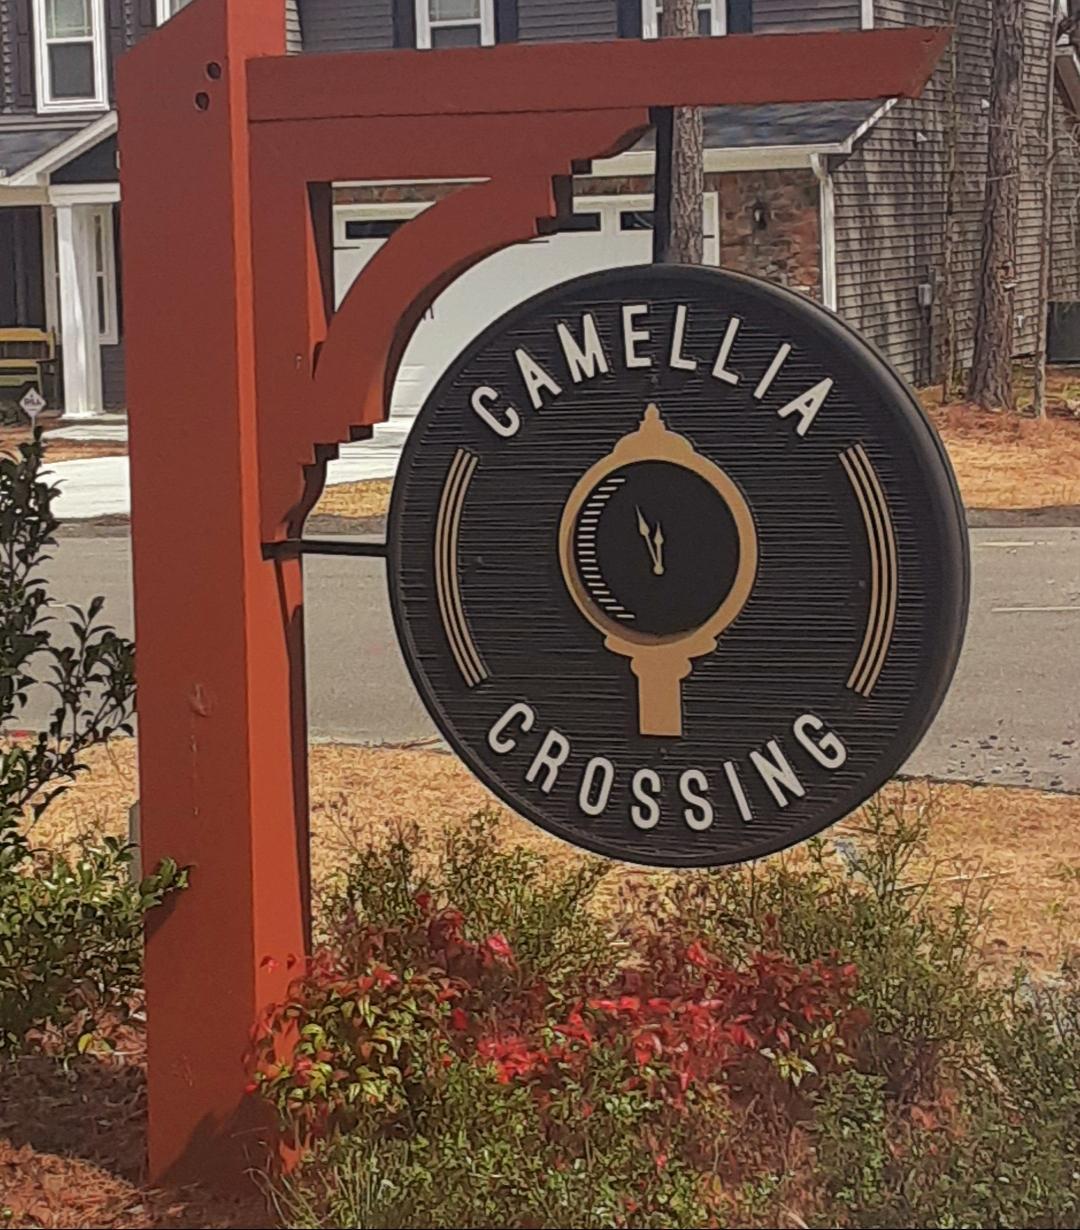 Camellia Crossing Sign